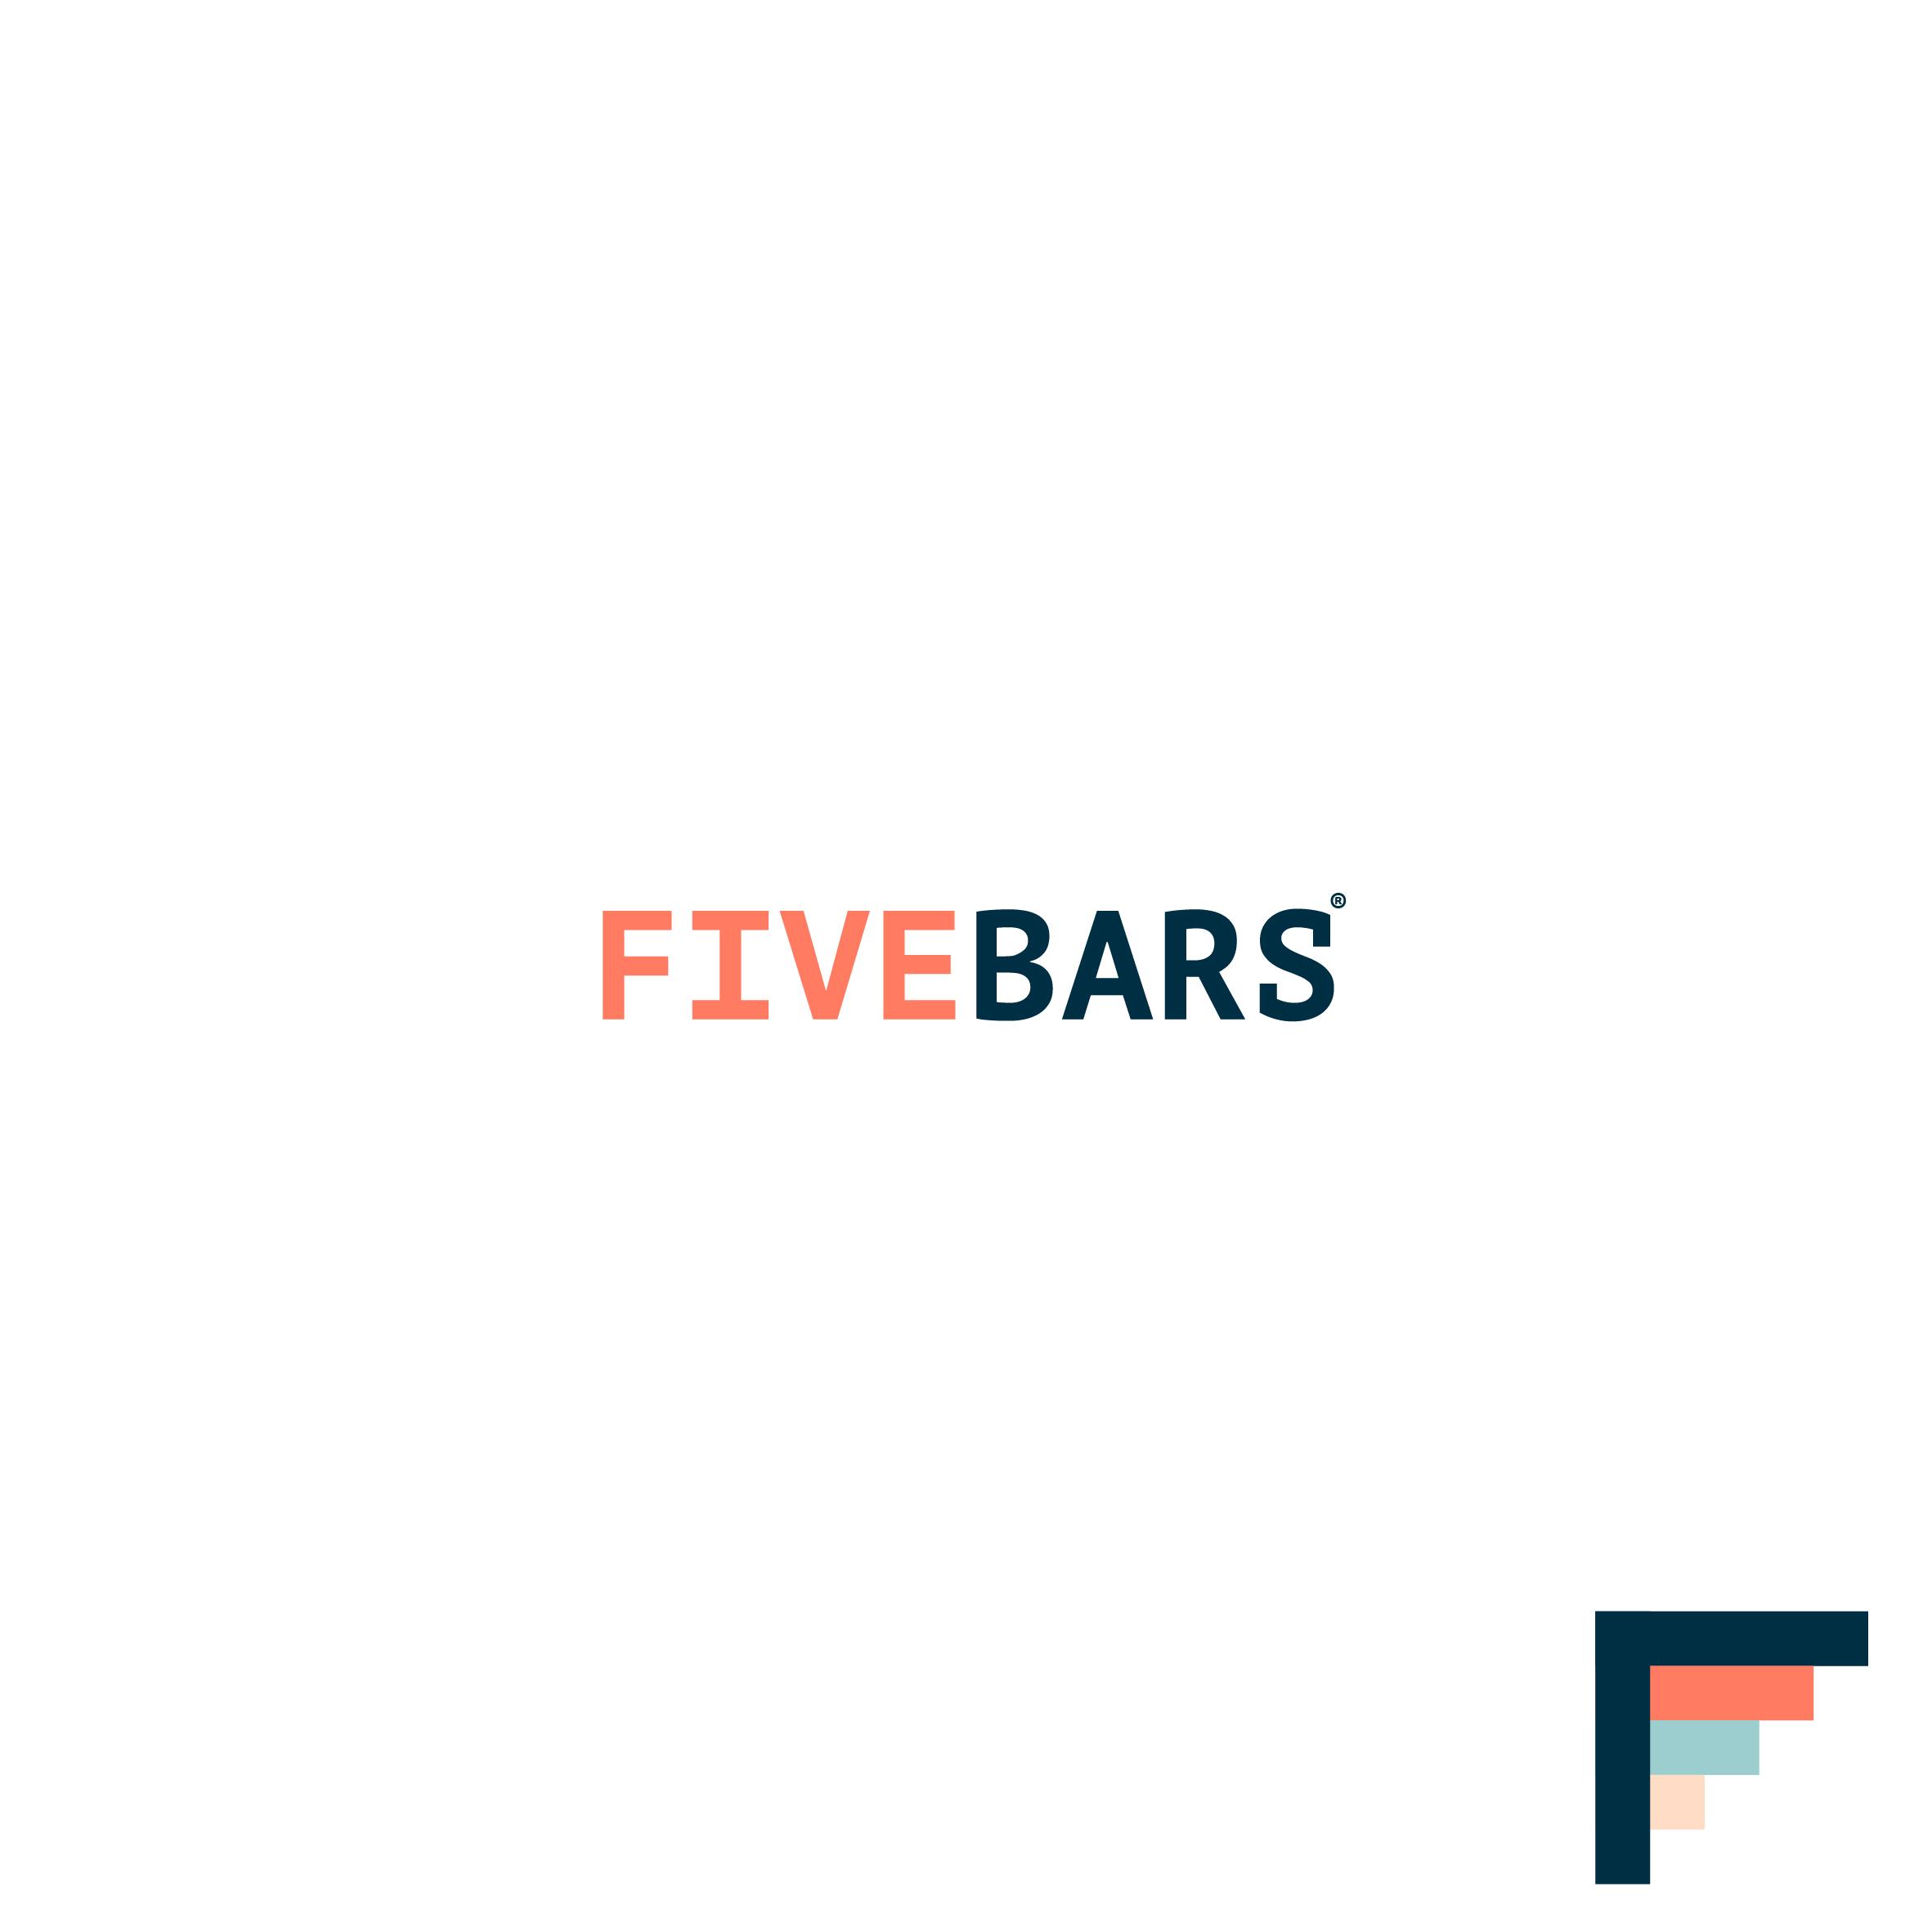 fivebars-02